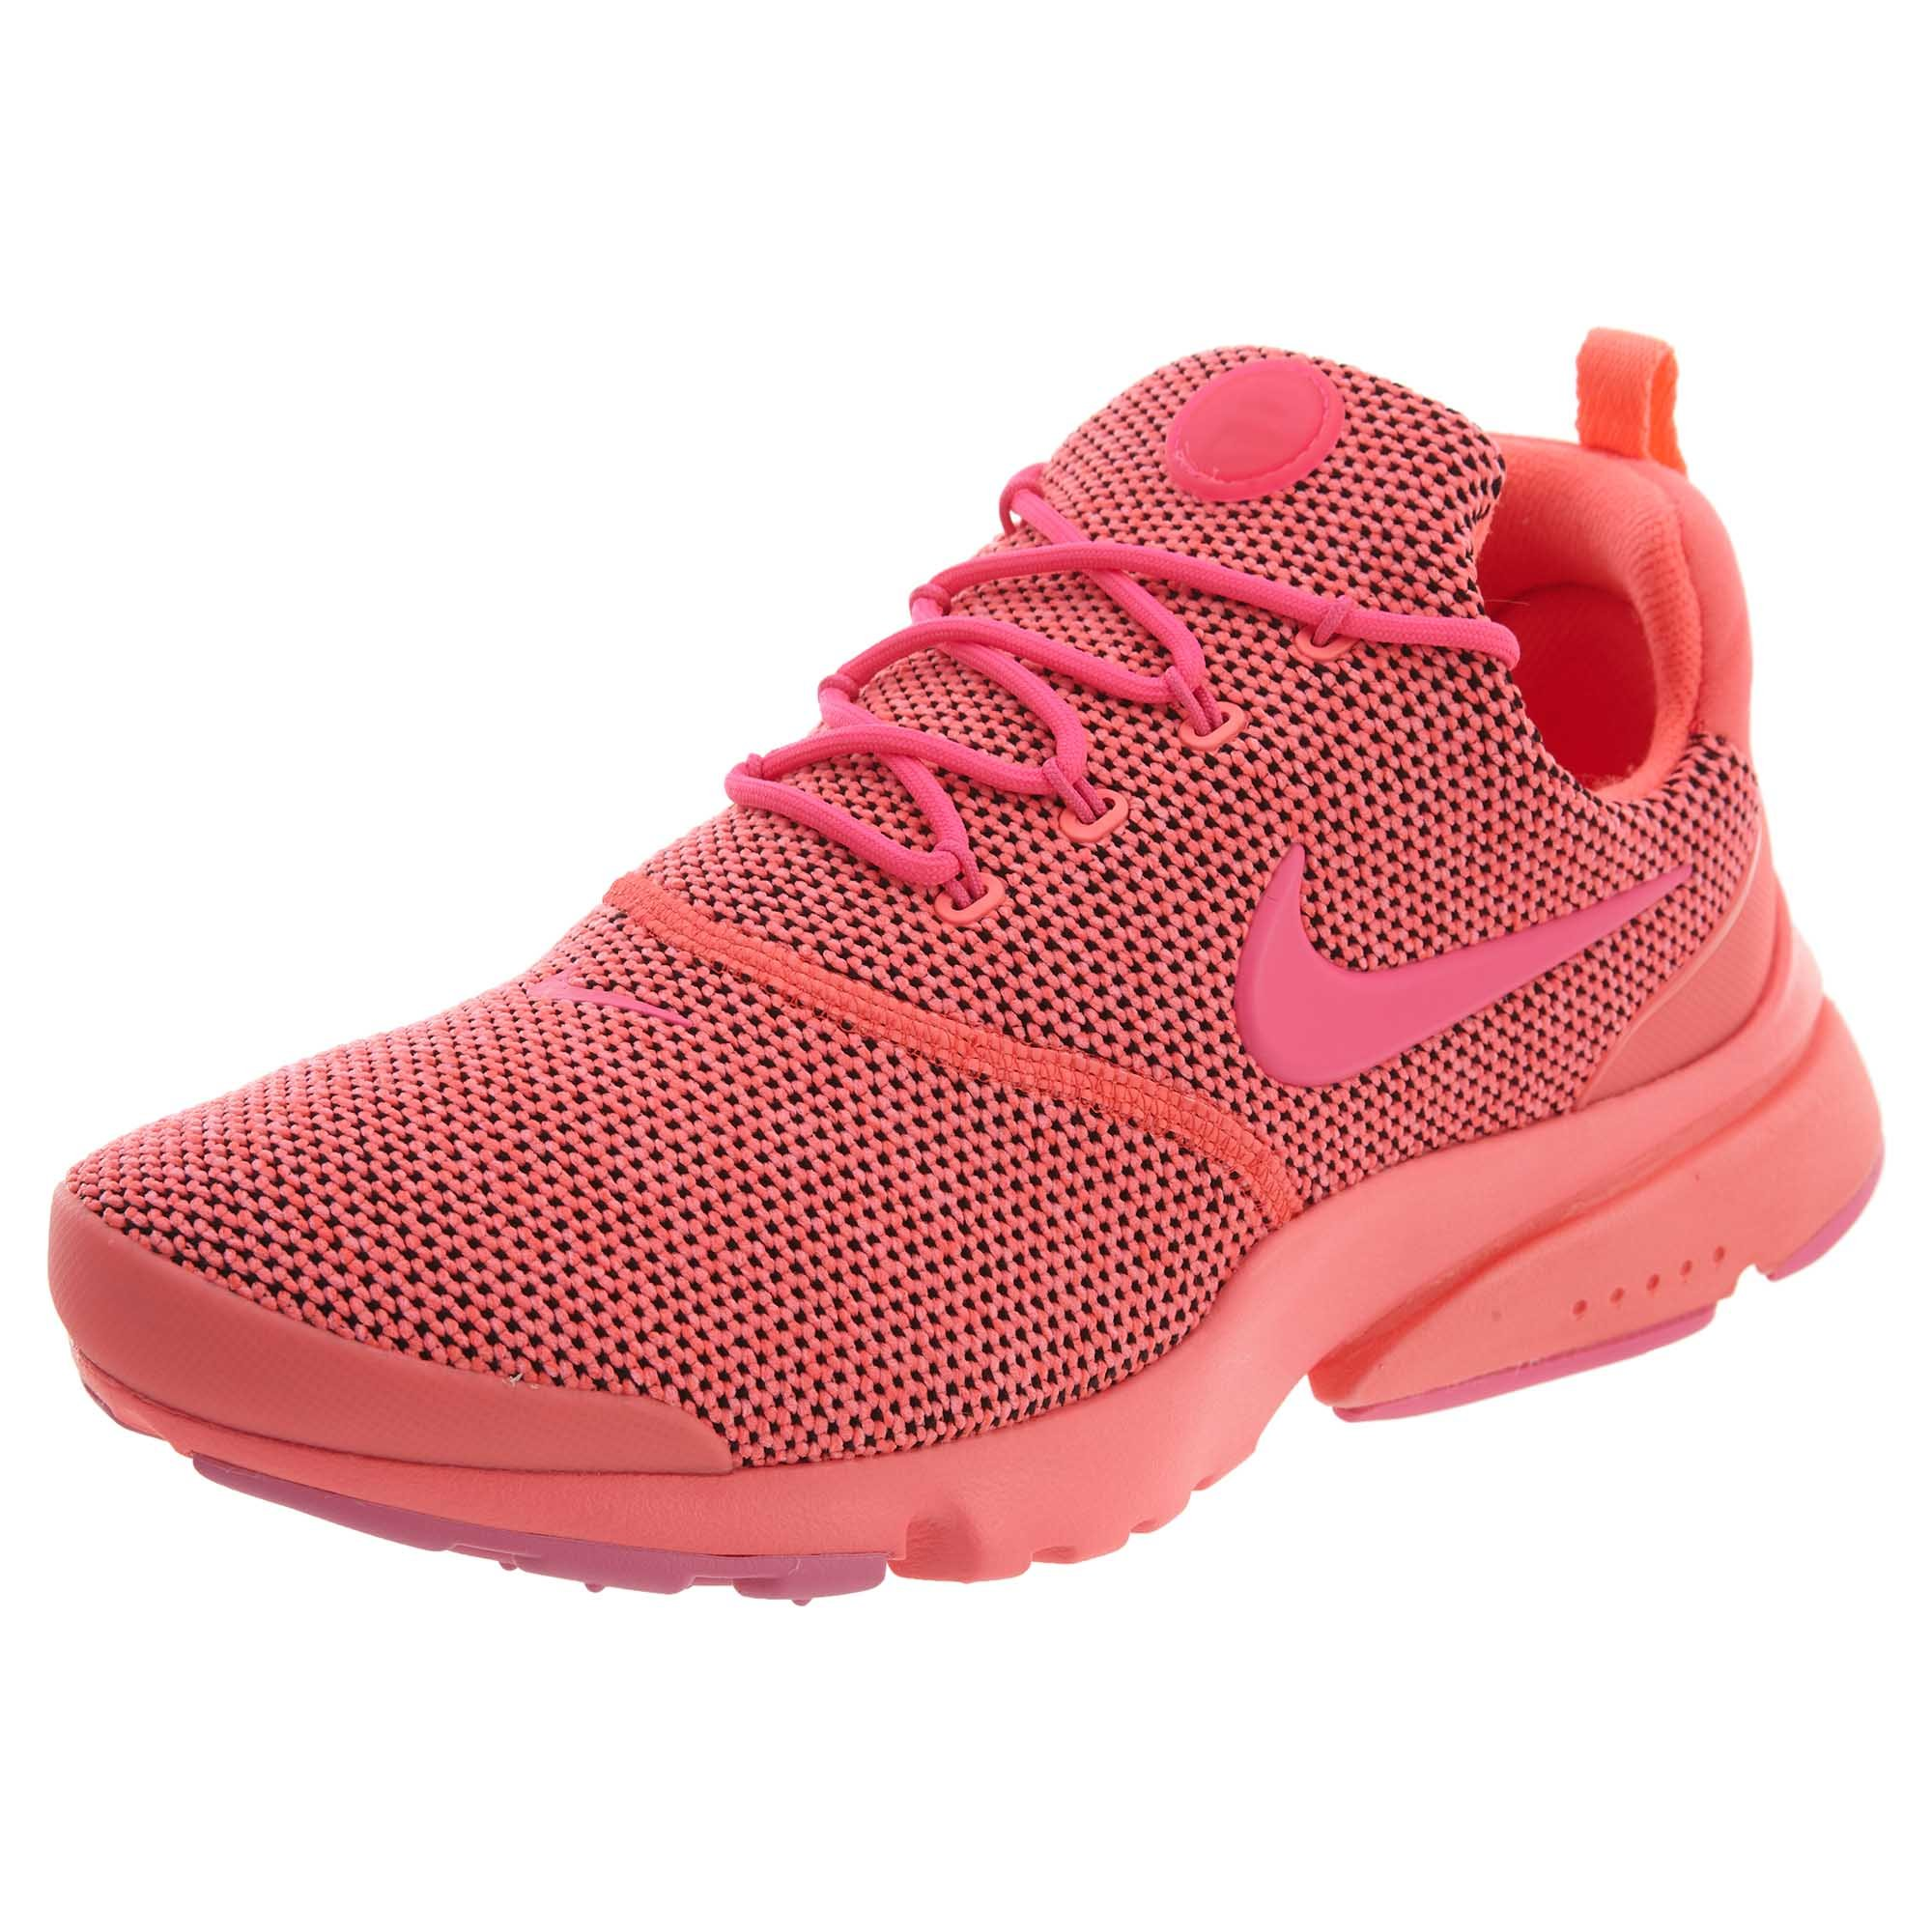 d9c8ebcc280e Galleon - Nike Women s Presto Fly SE Running Shoe (9 B(M) US